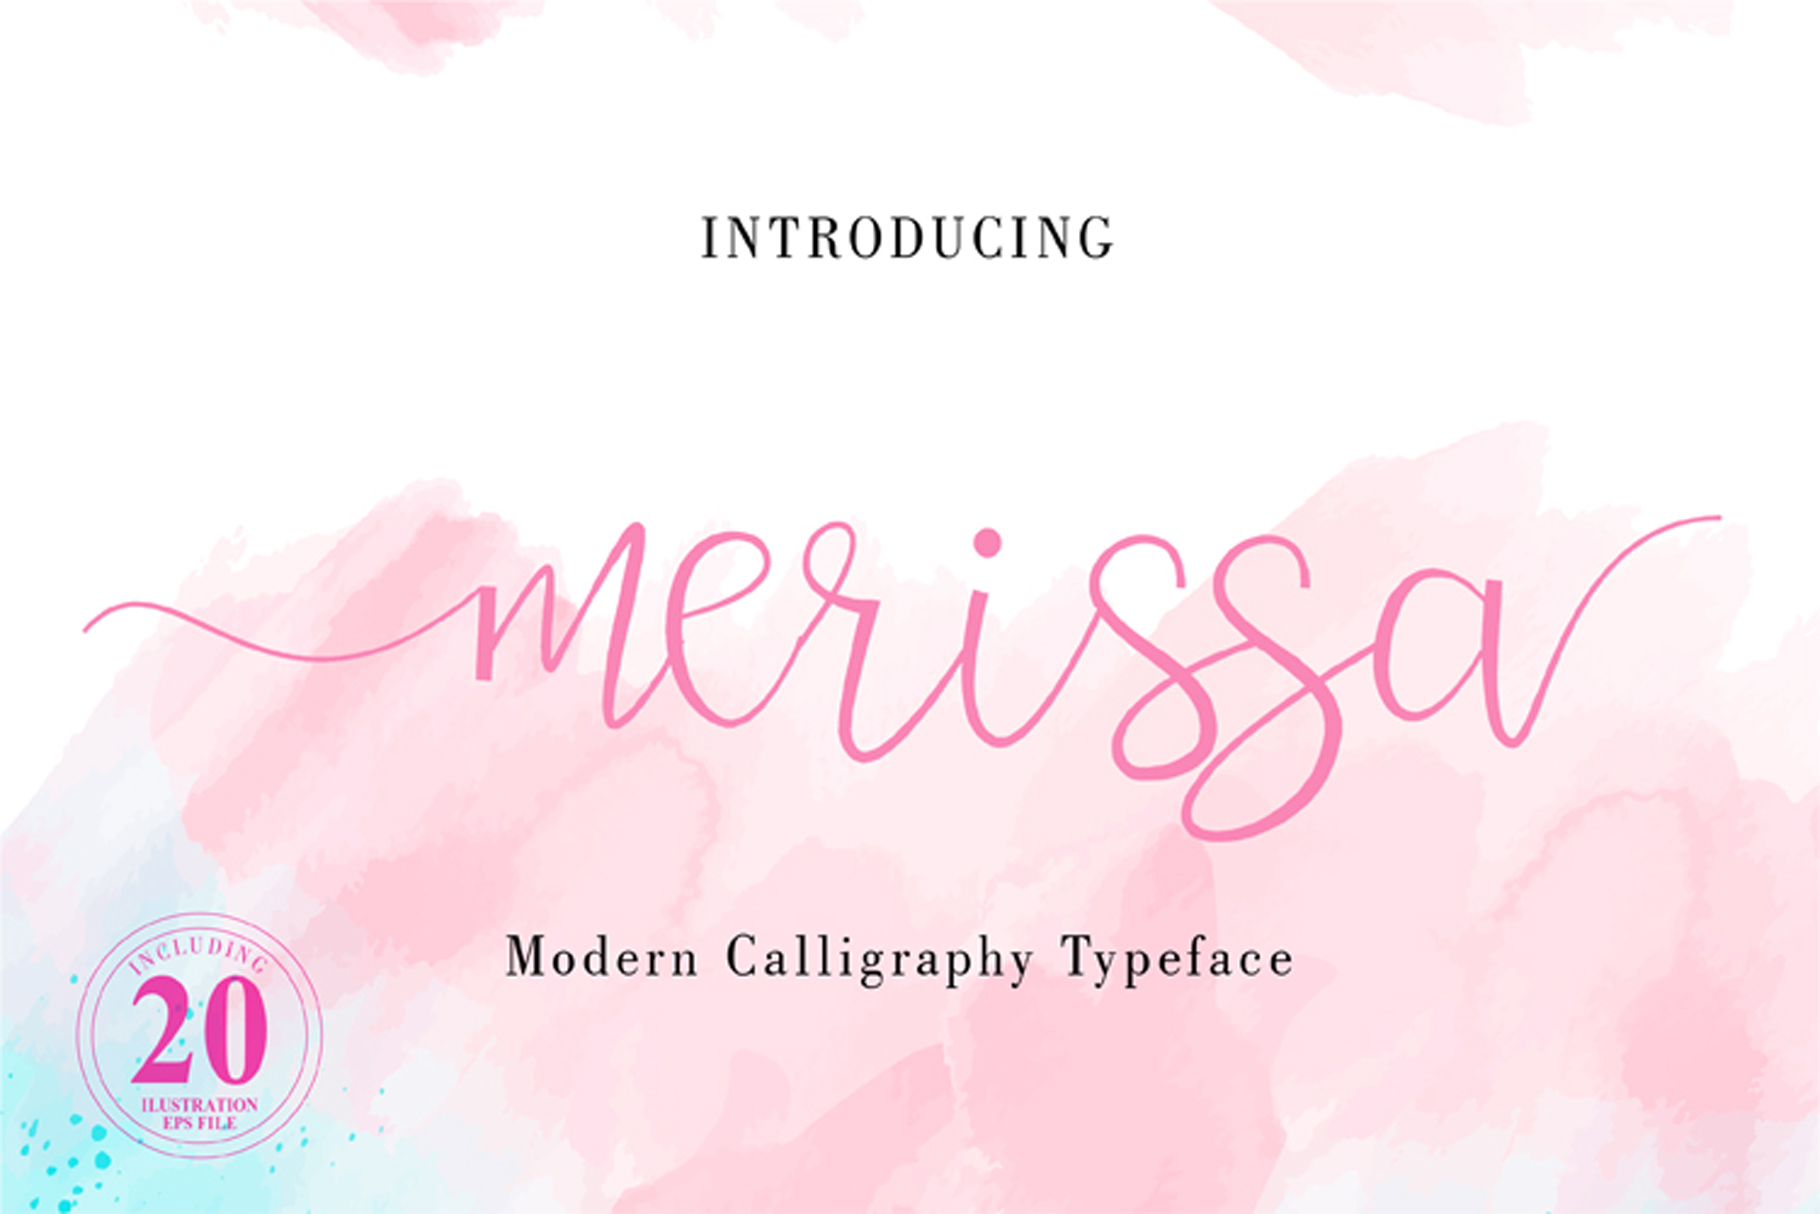 merissa example image 1